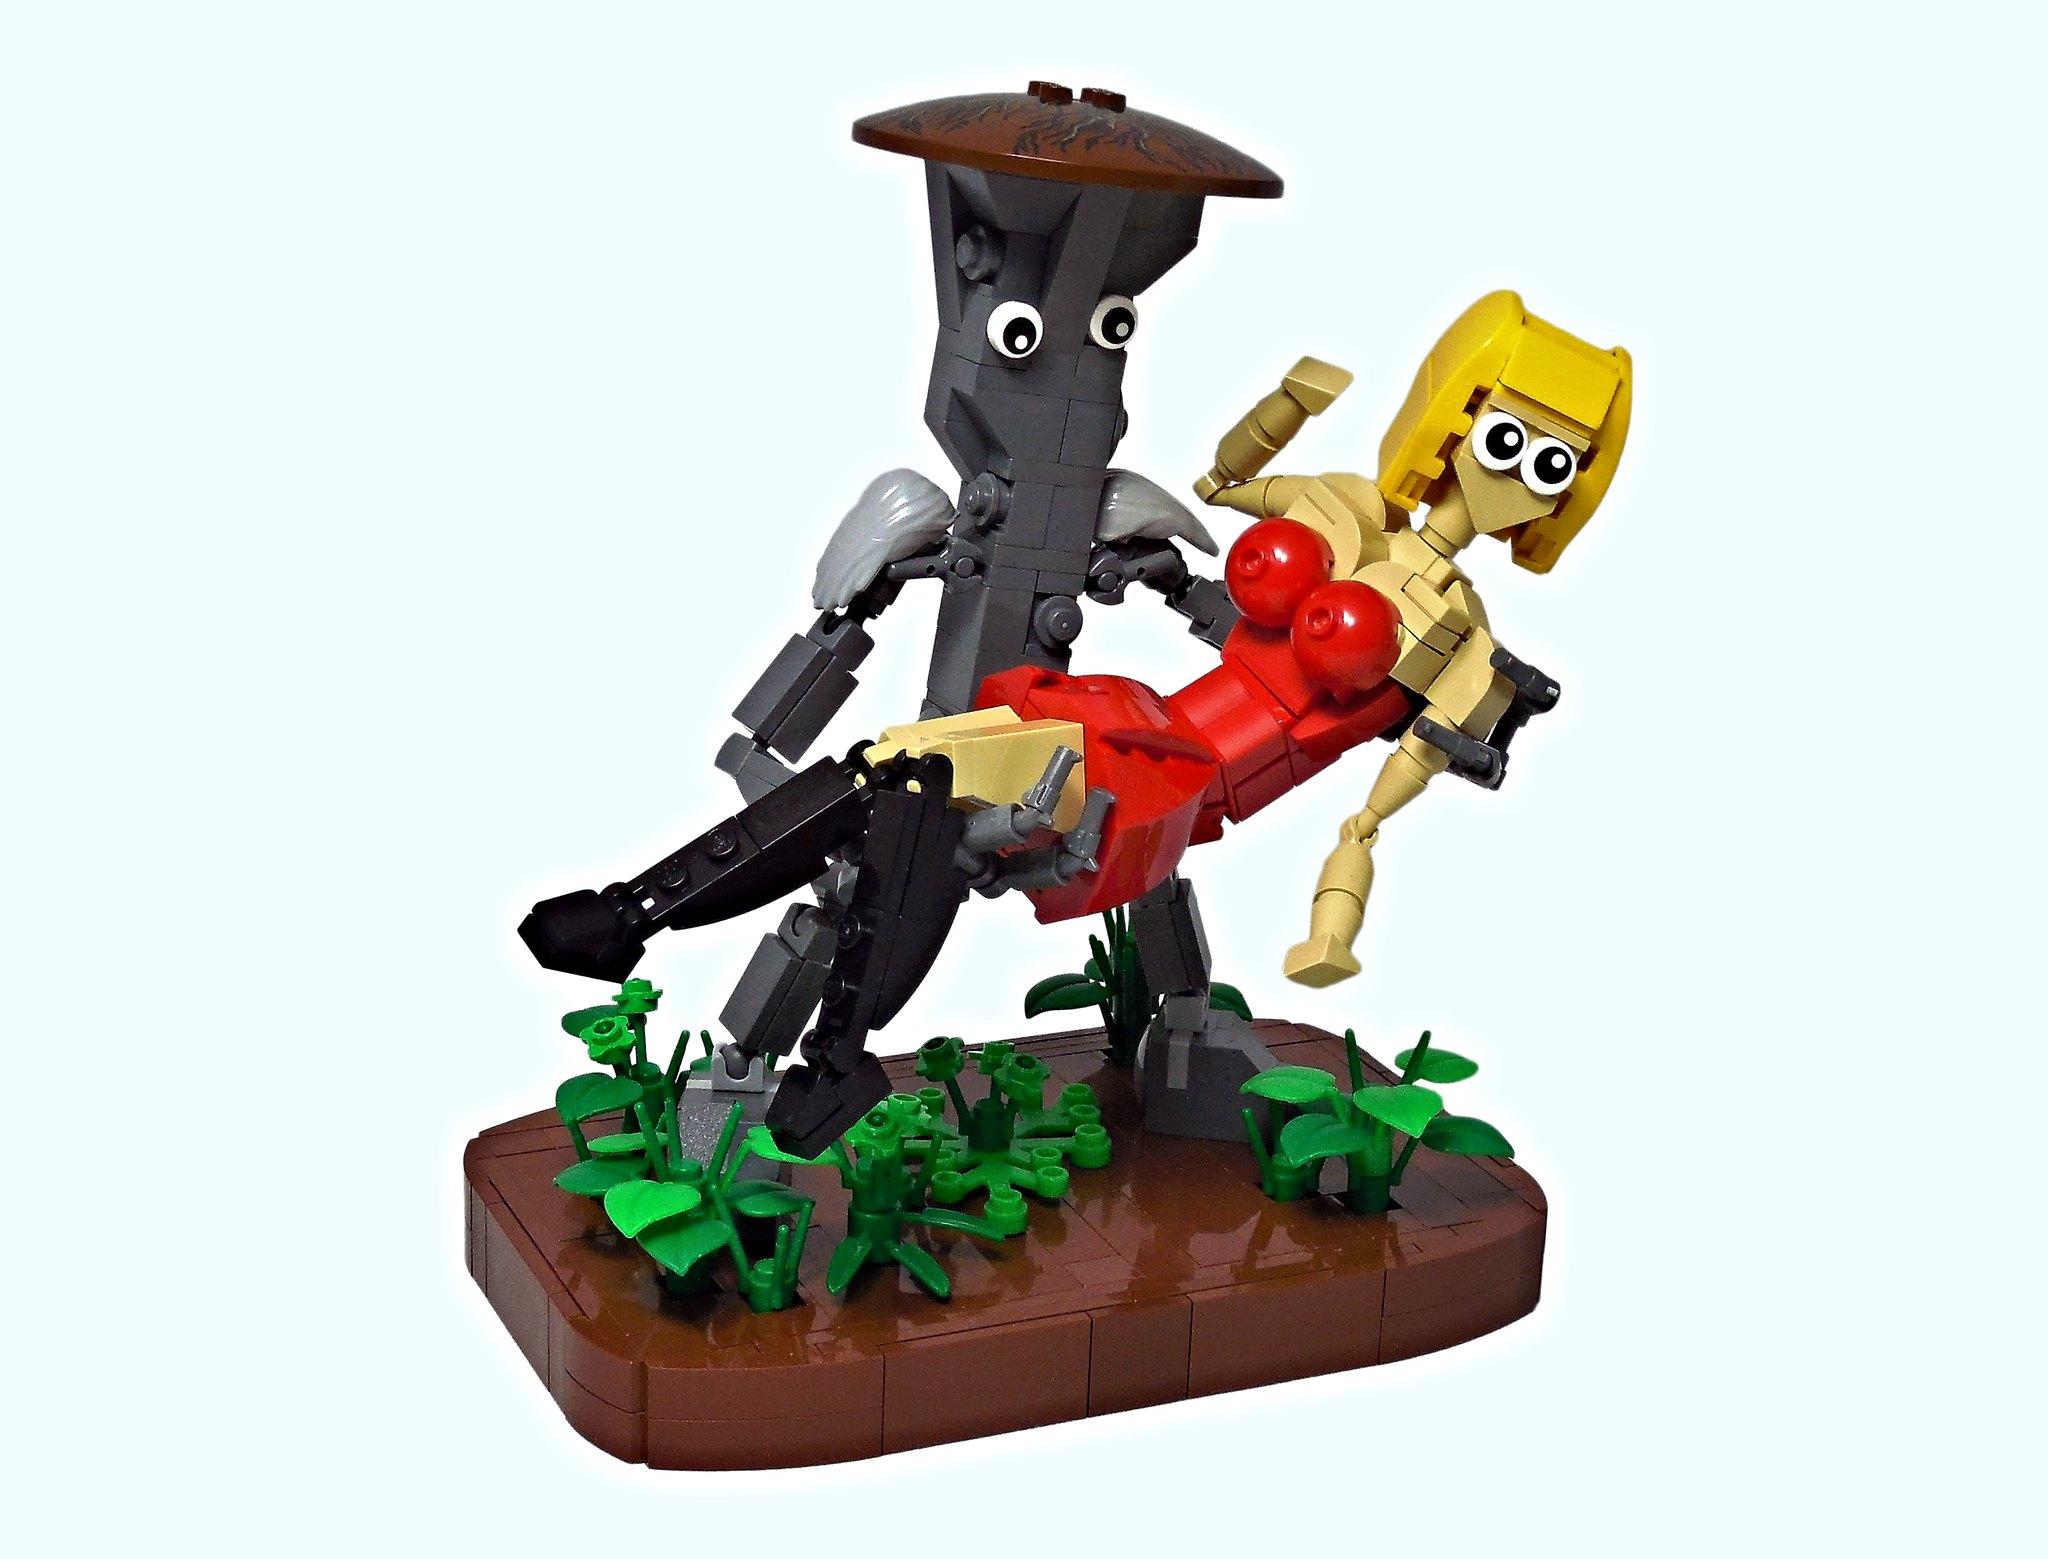 LEGO® MOC by Vitreolum: Matango!